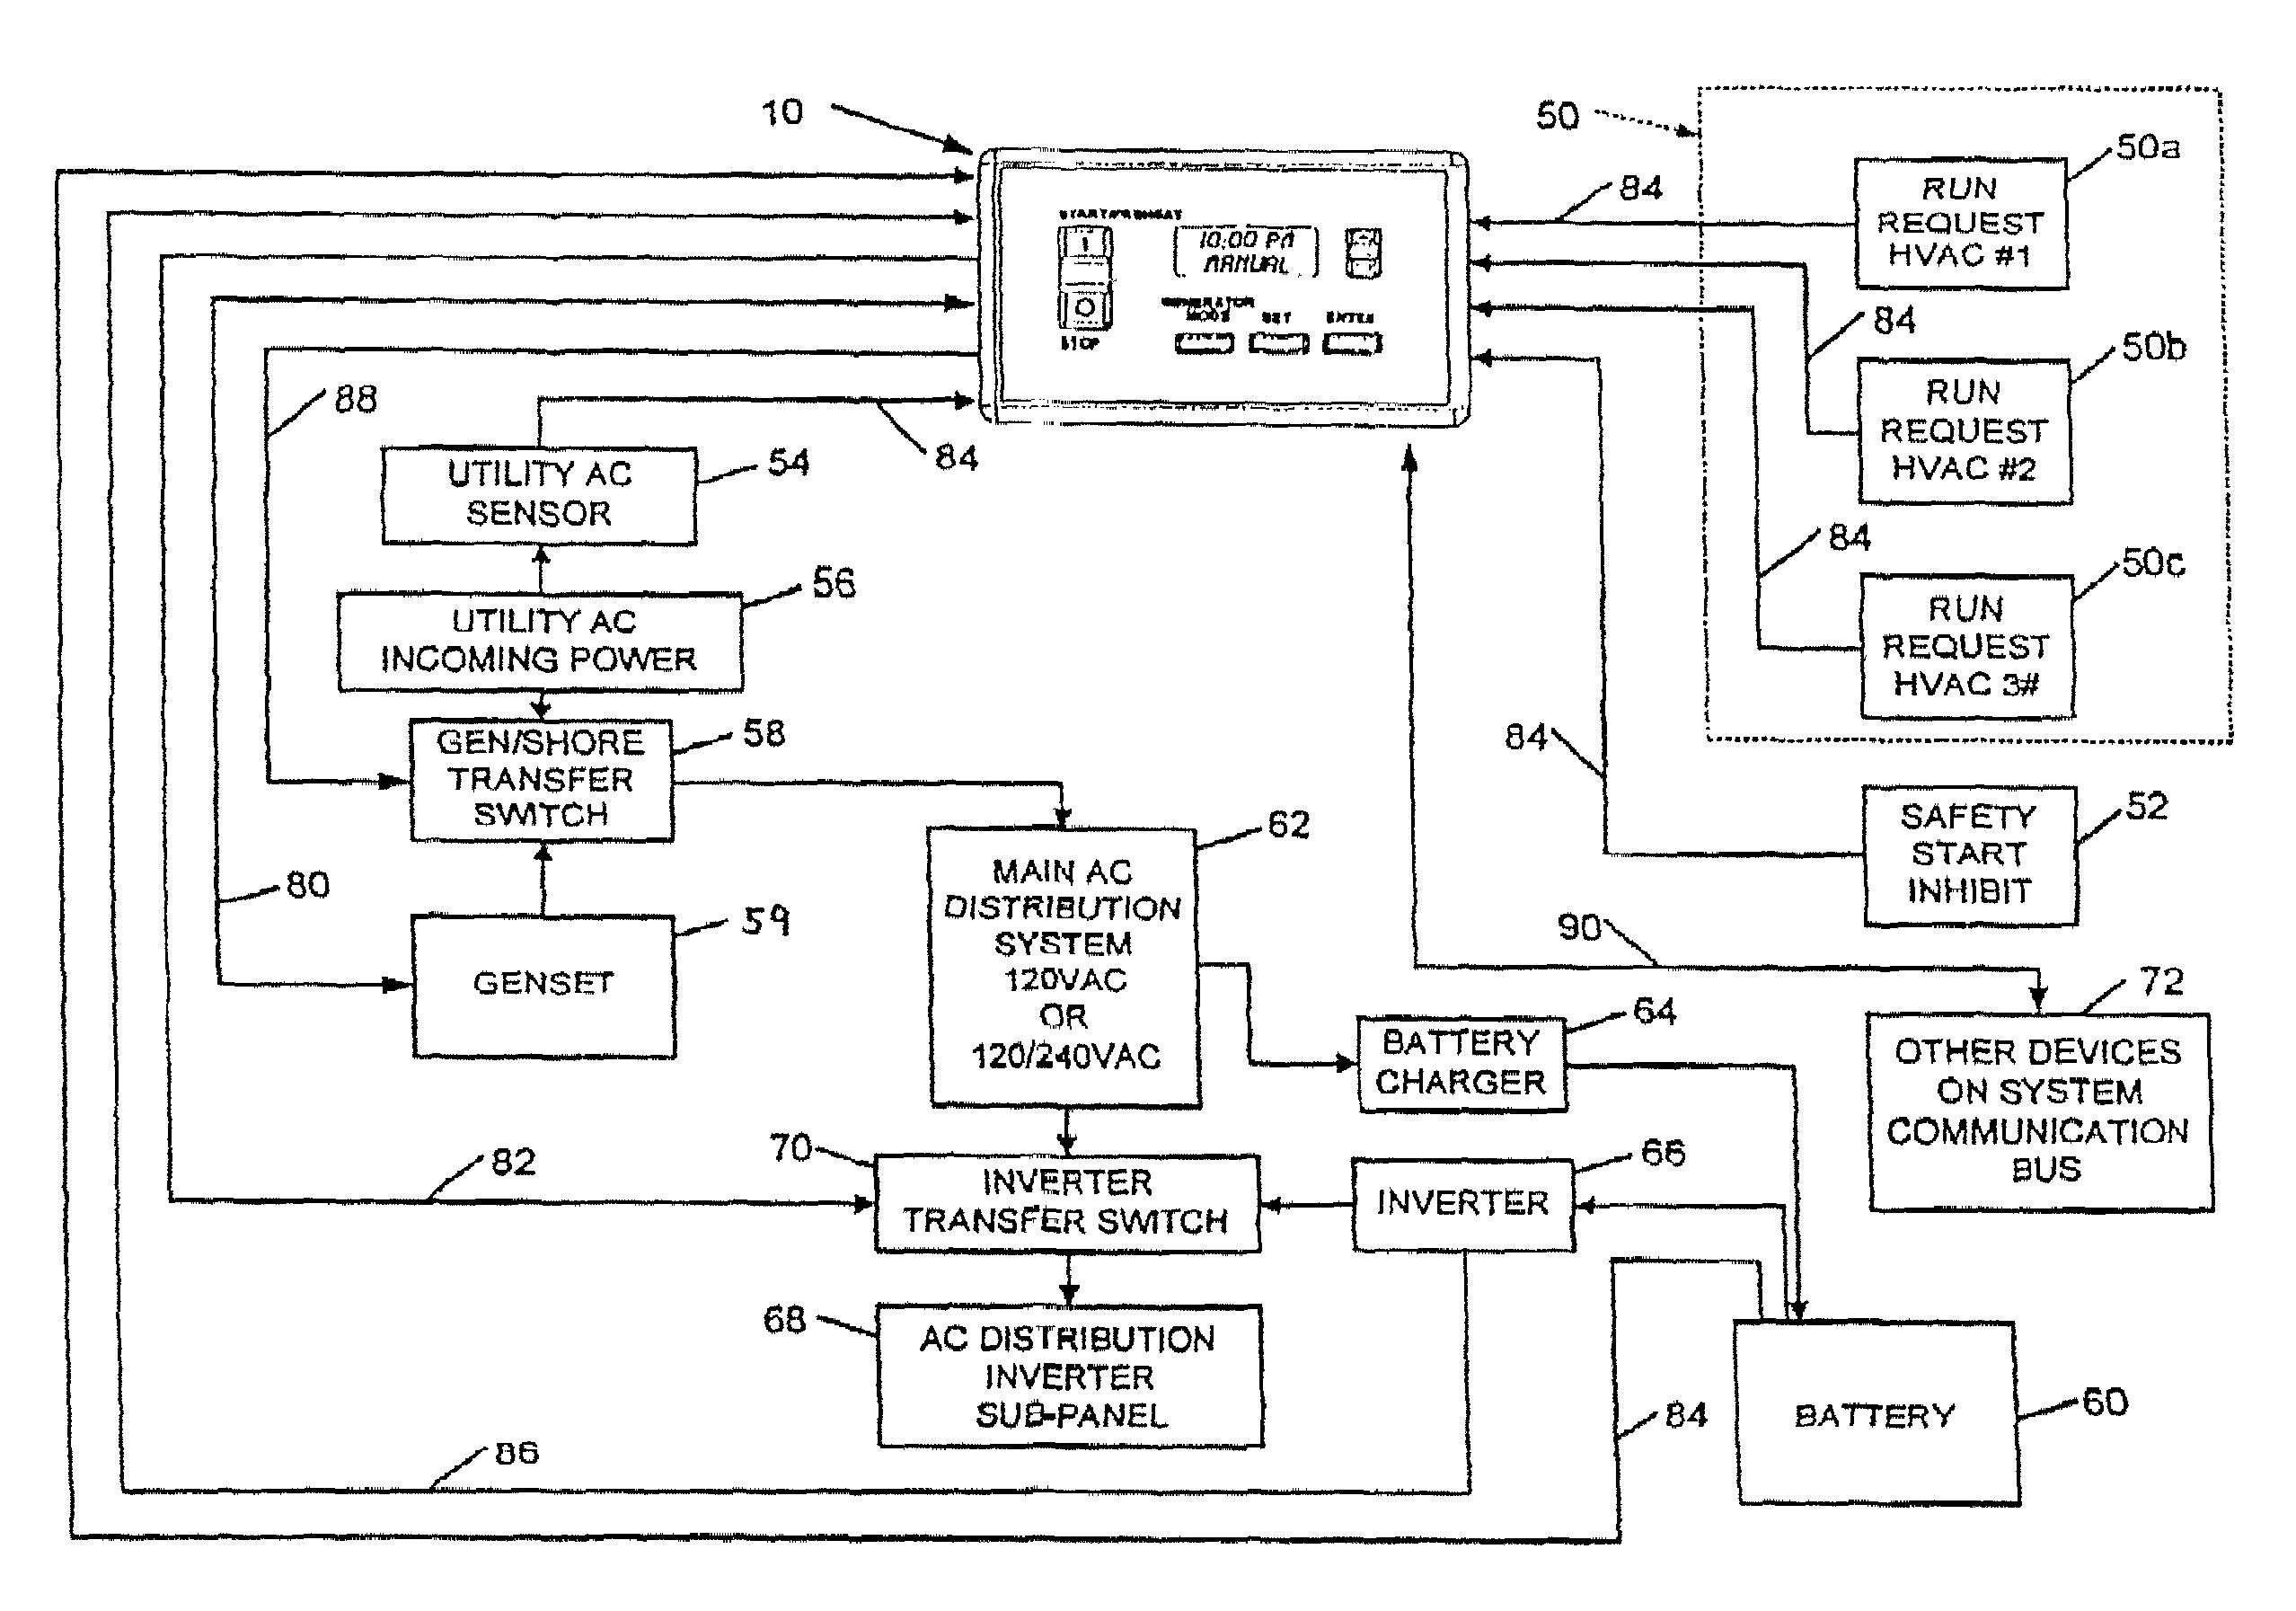 3 battery wiring diagram rv car radio antenna patent us7692409 - generator controller google patents